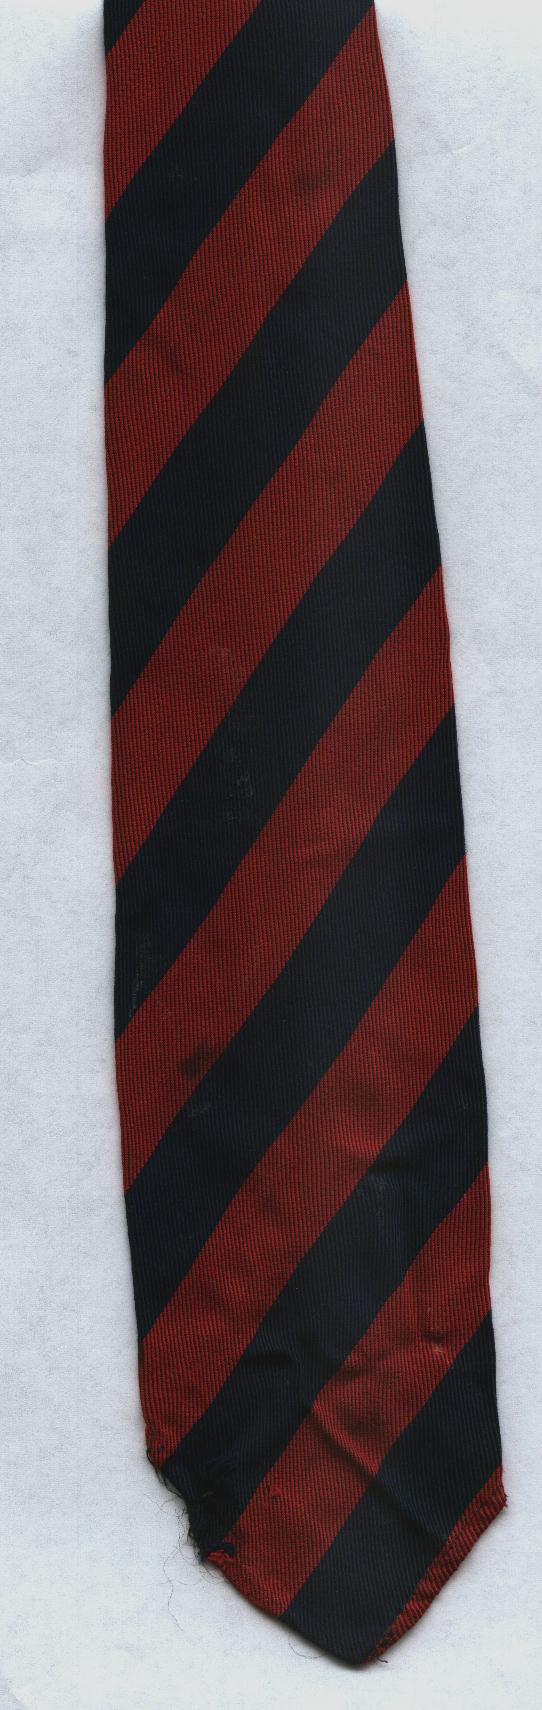 Dartmouth Academy tie